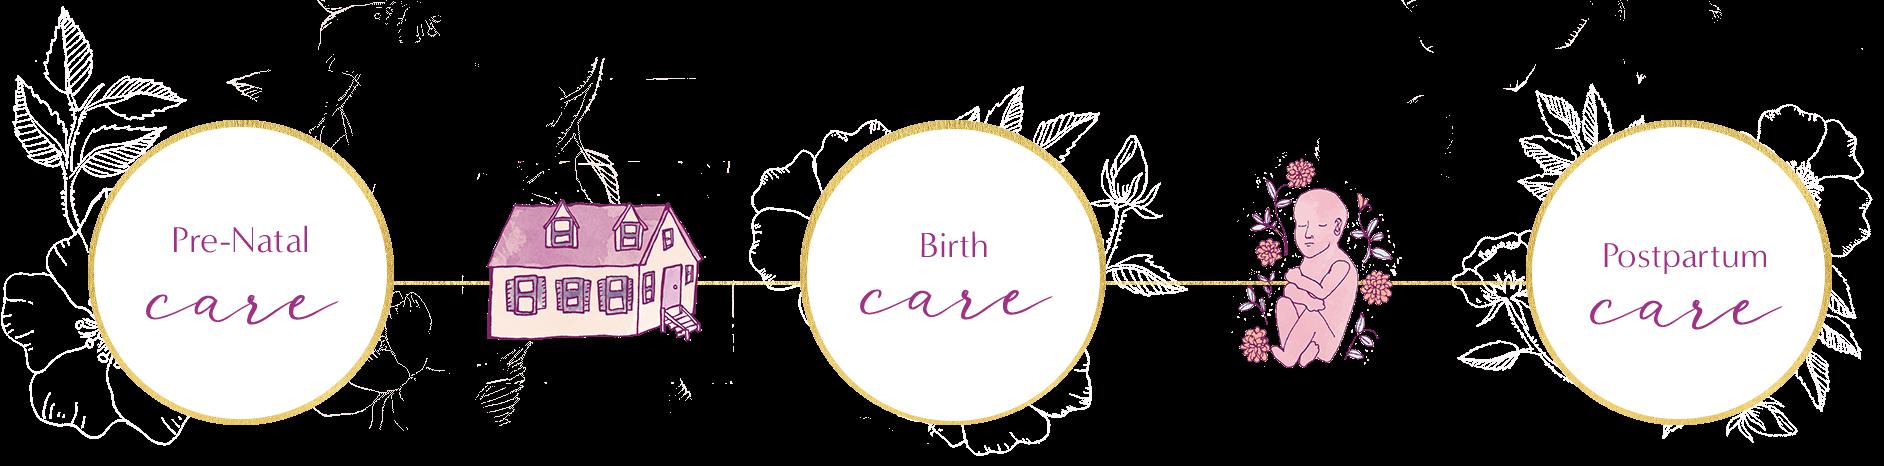 care line